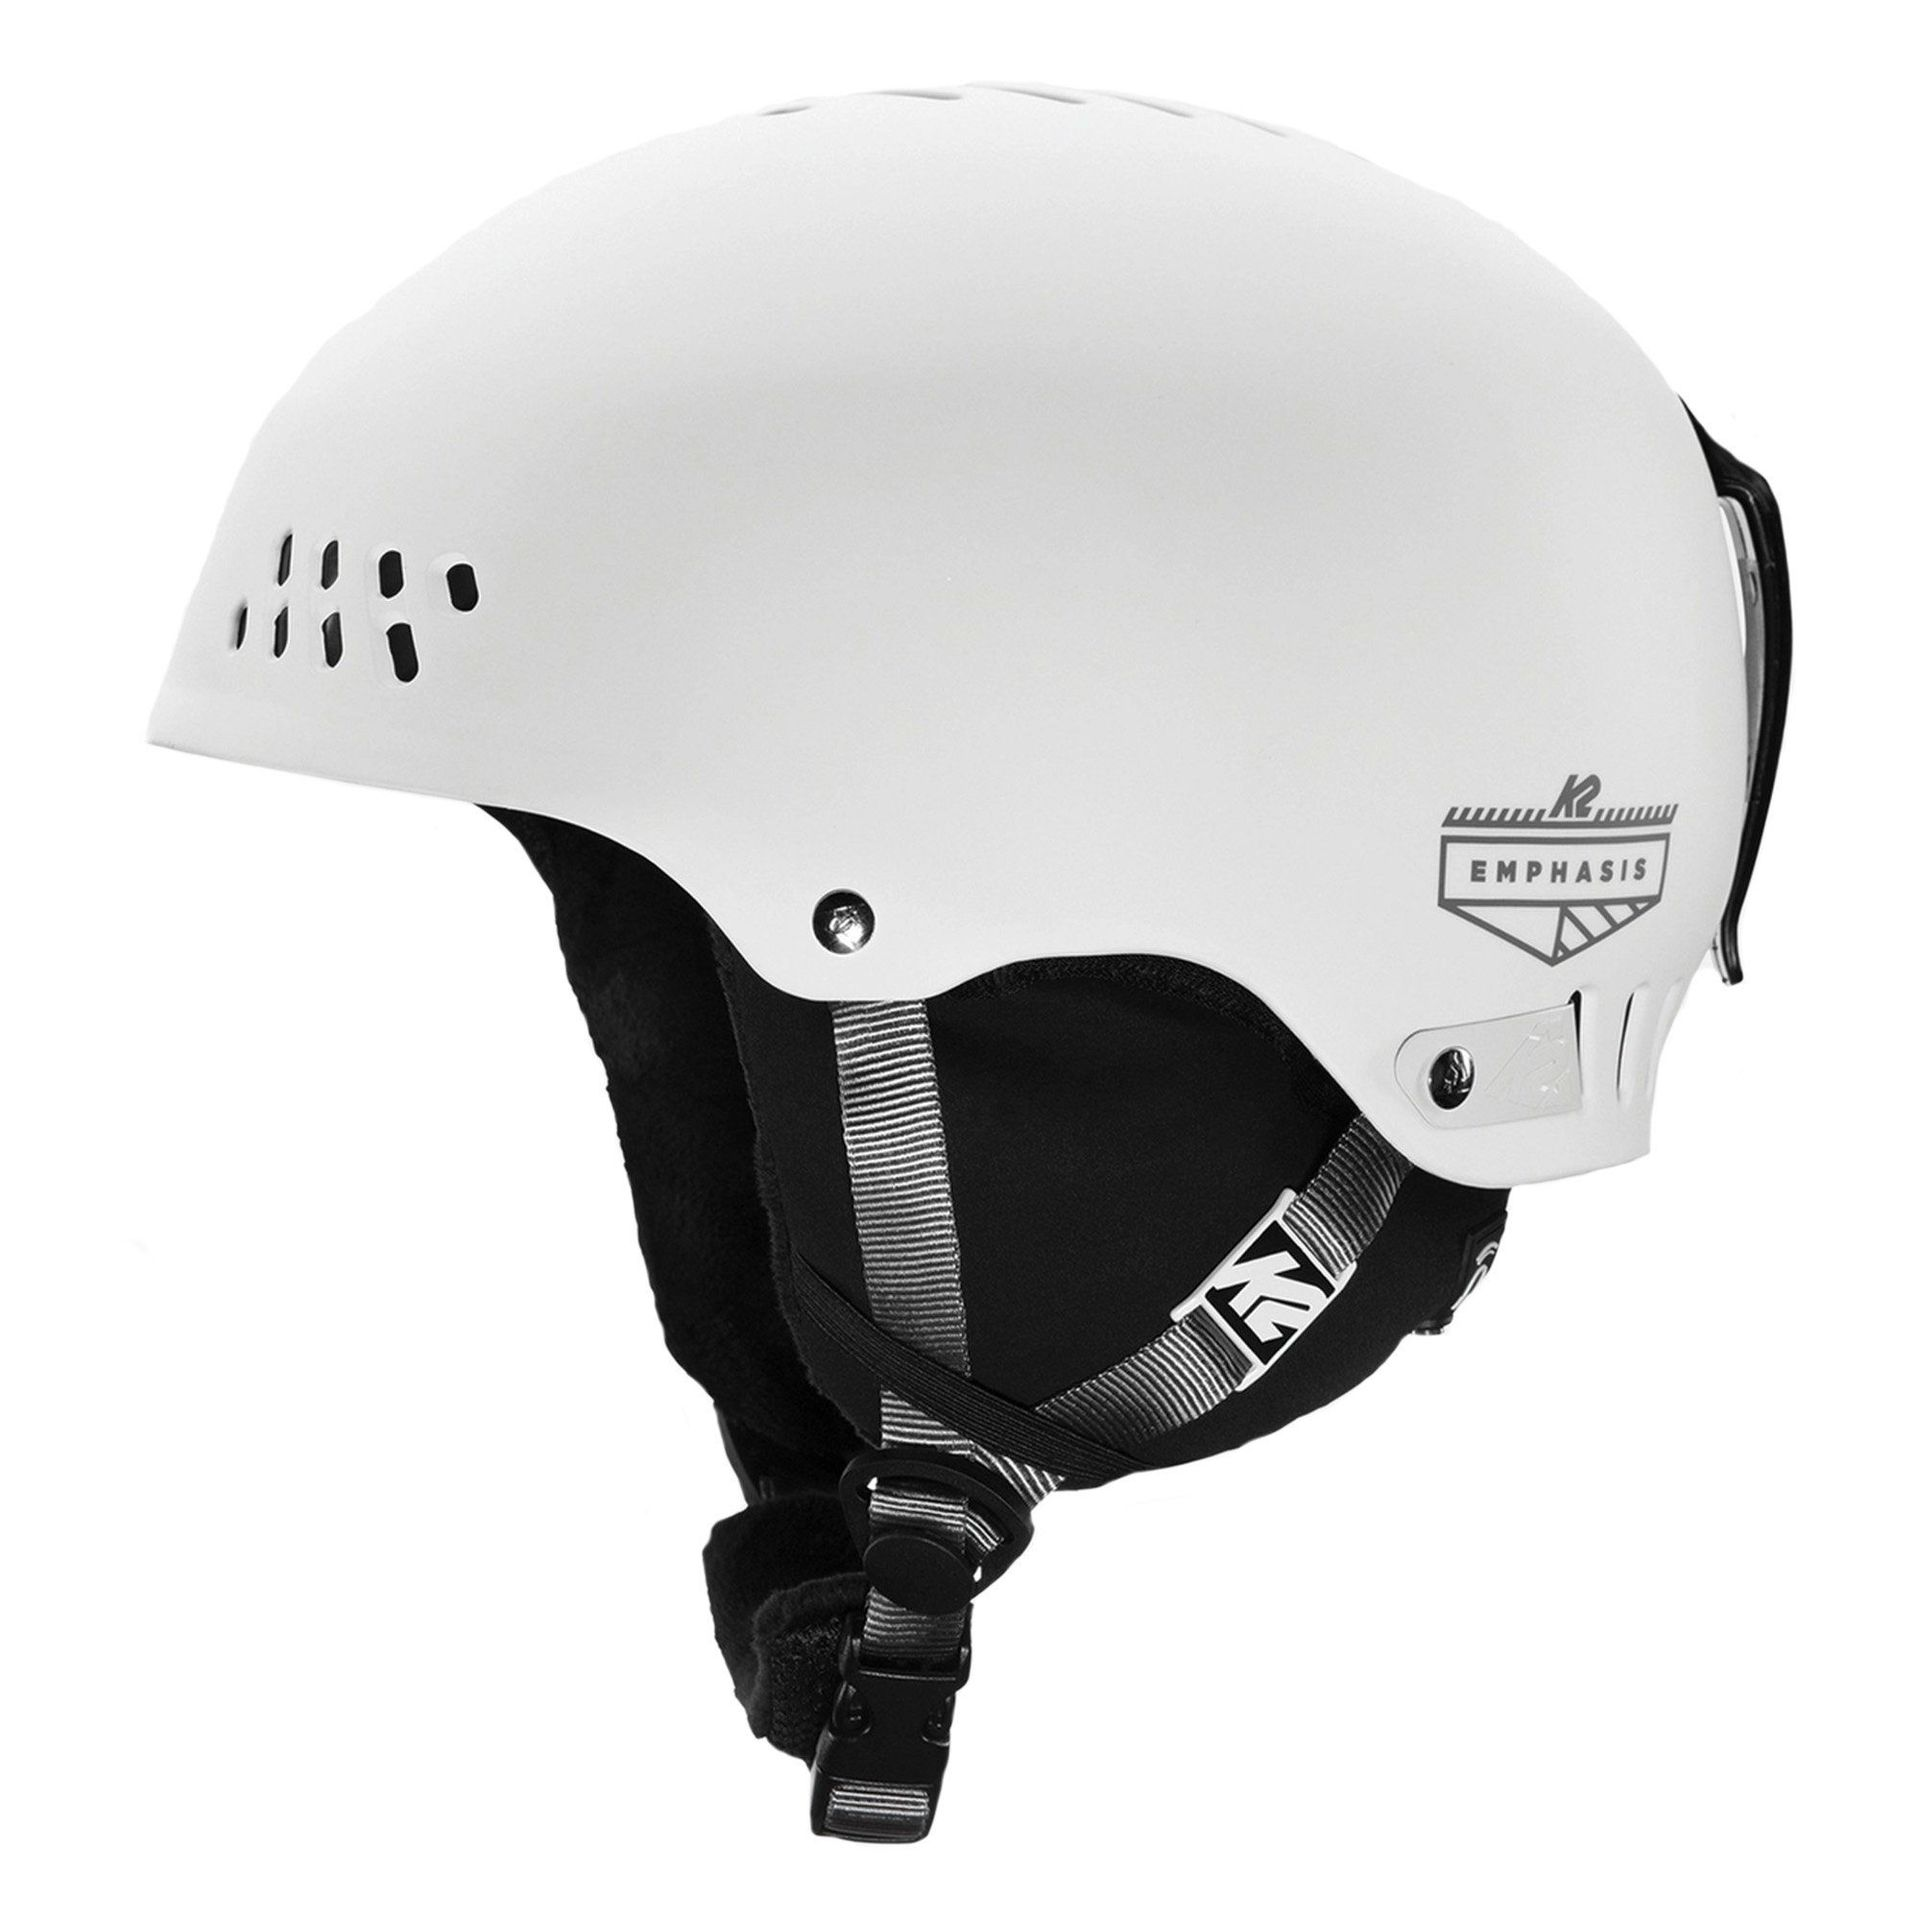 KASK K2 EMPHASIS 1054008-22 WHITE